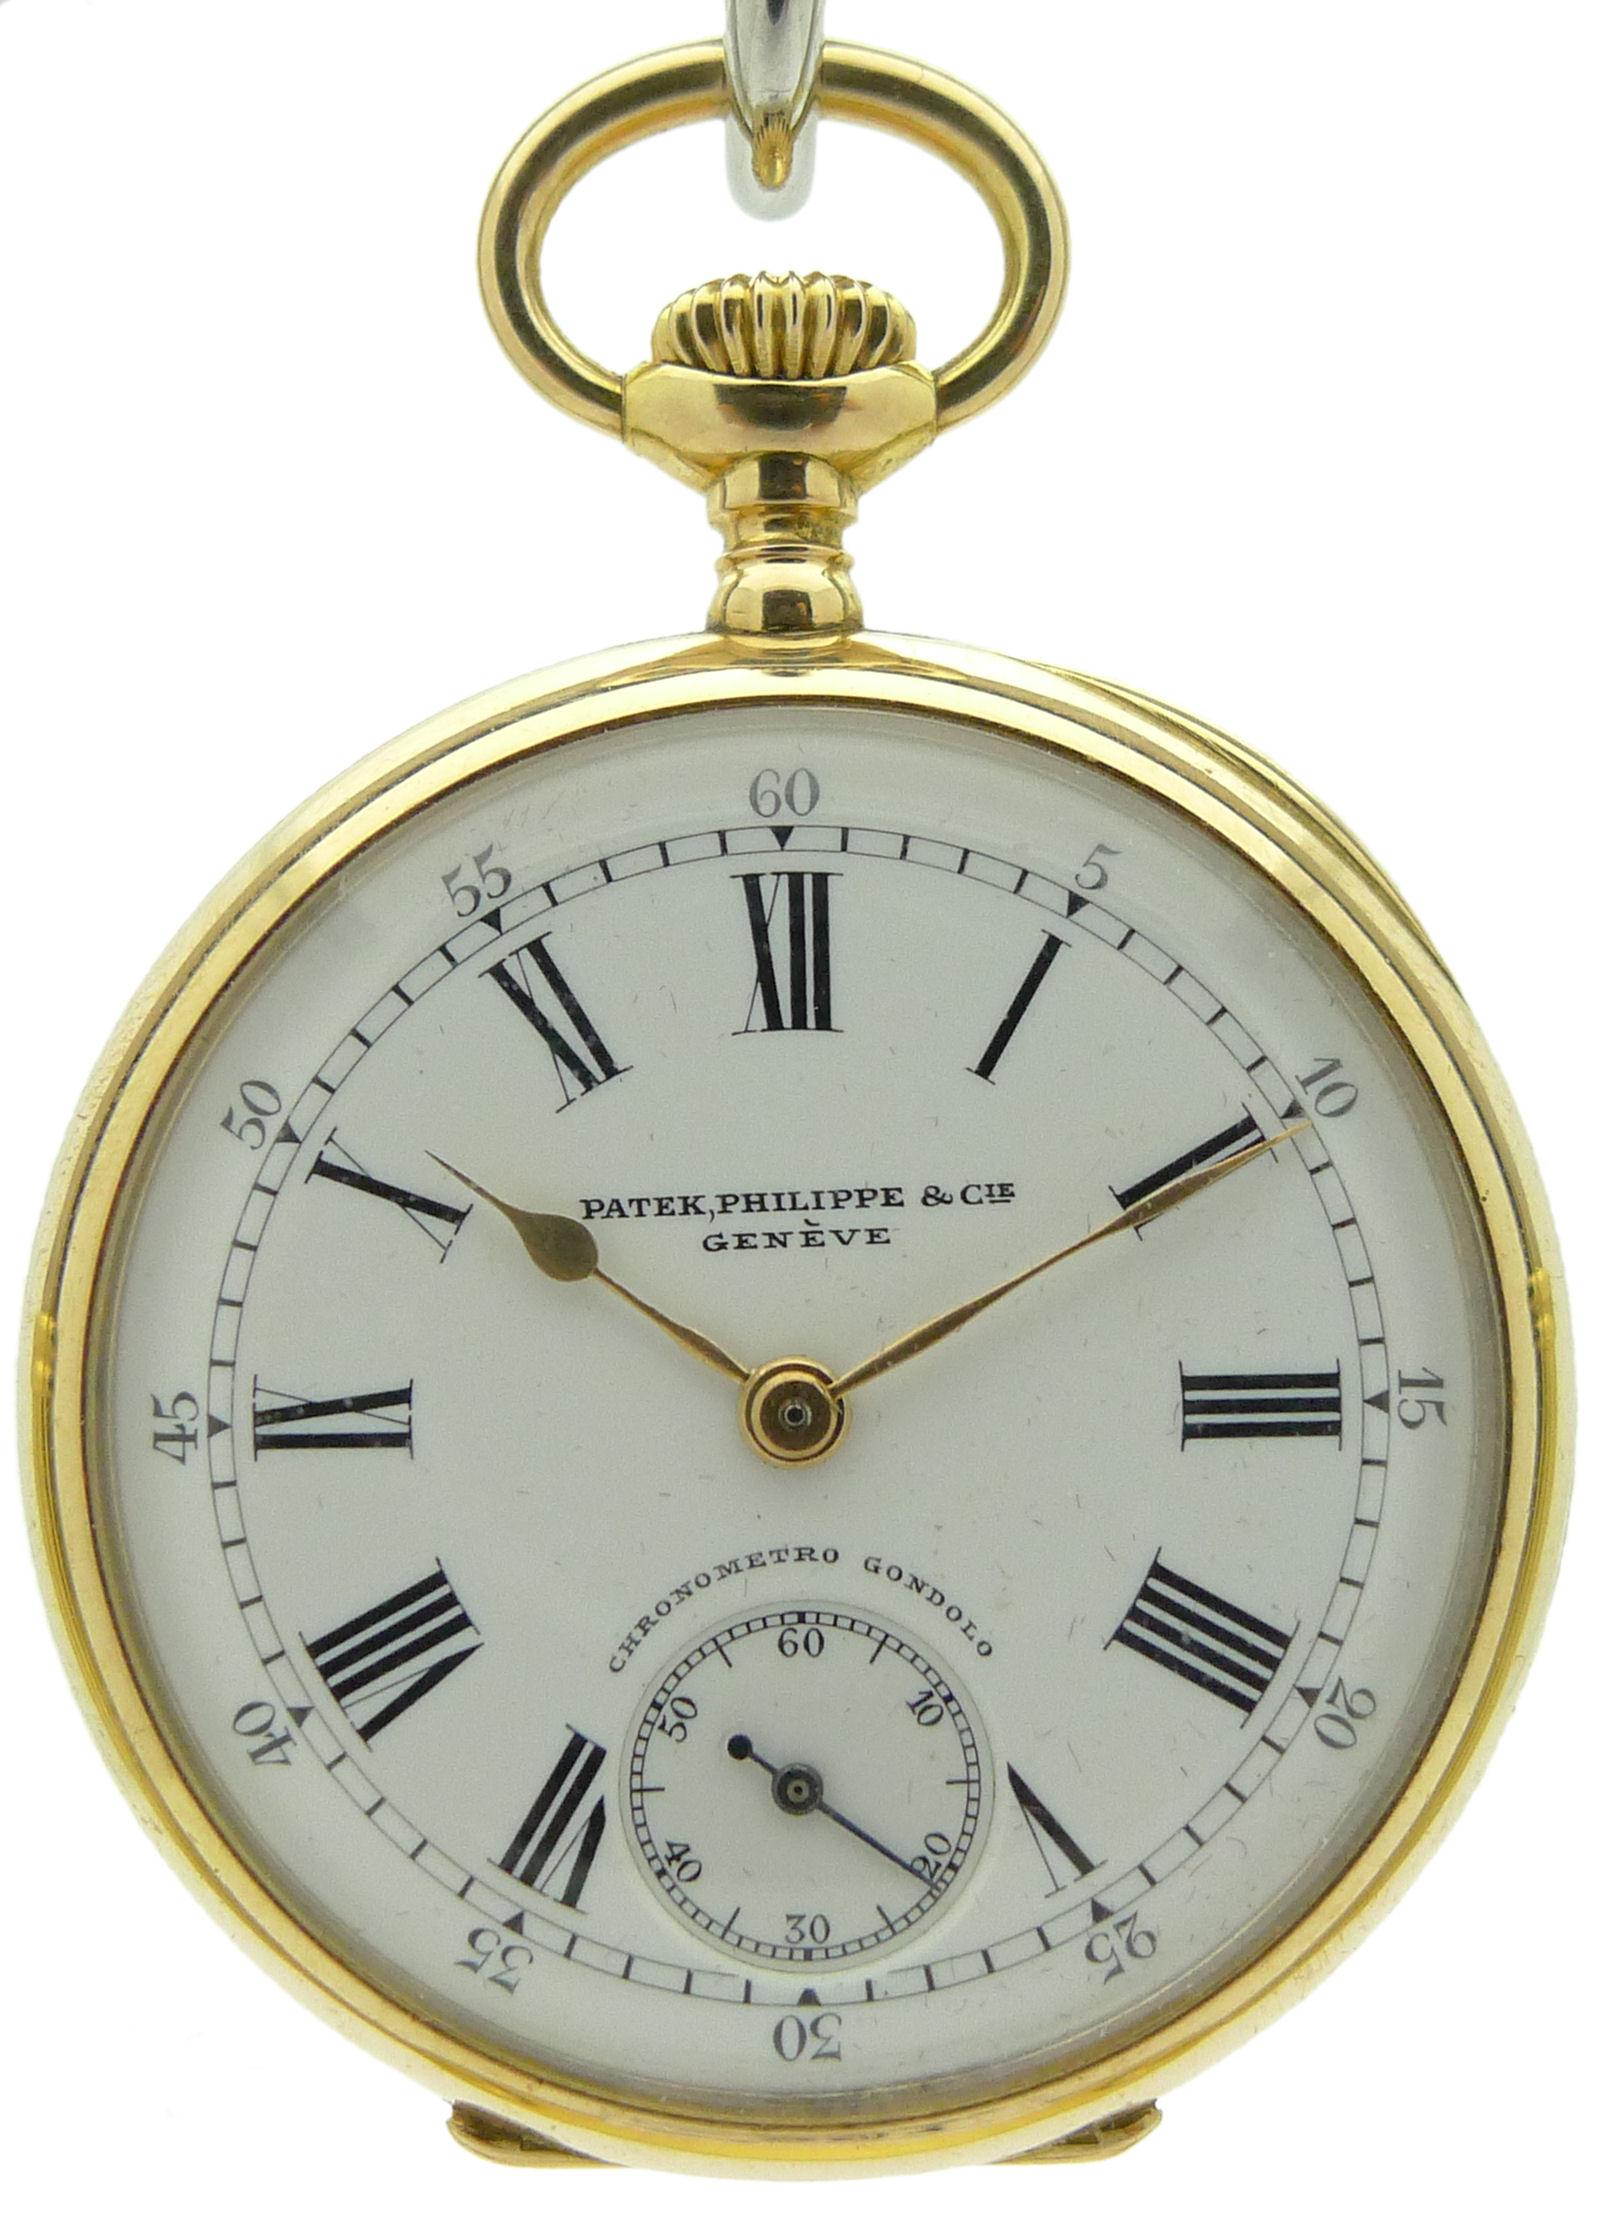 Patek Philippe Pp 5205 R Rosegold Black Dial Annual: Patek Philippe Gondolo Ladies Pocket Watch 1912 Original